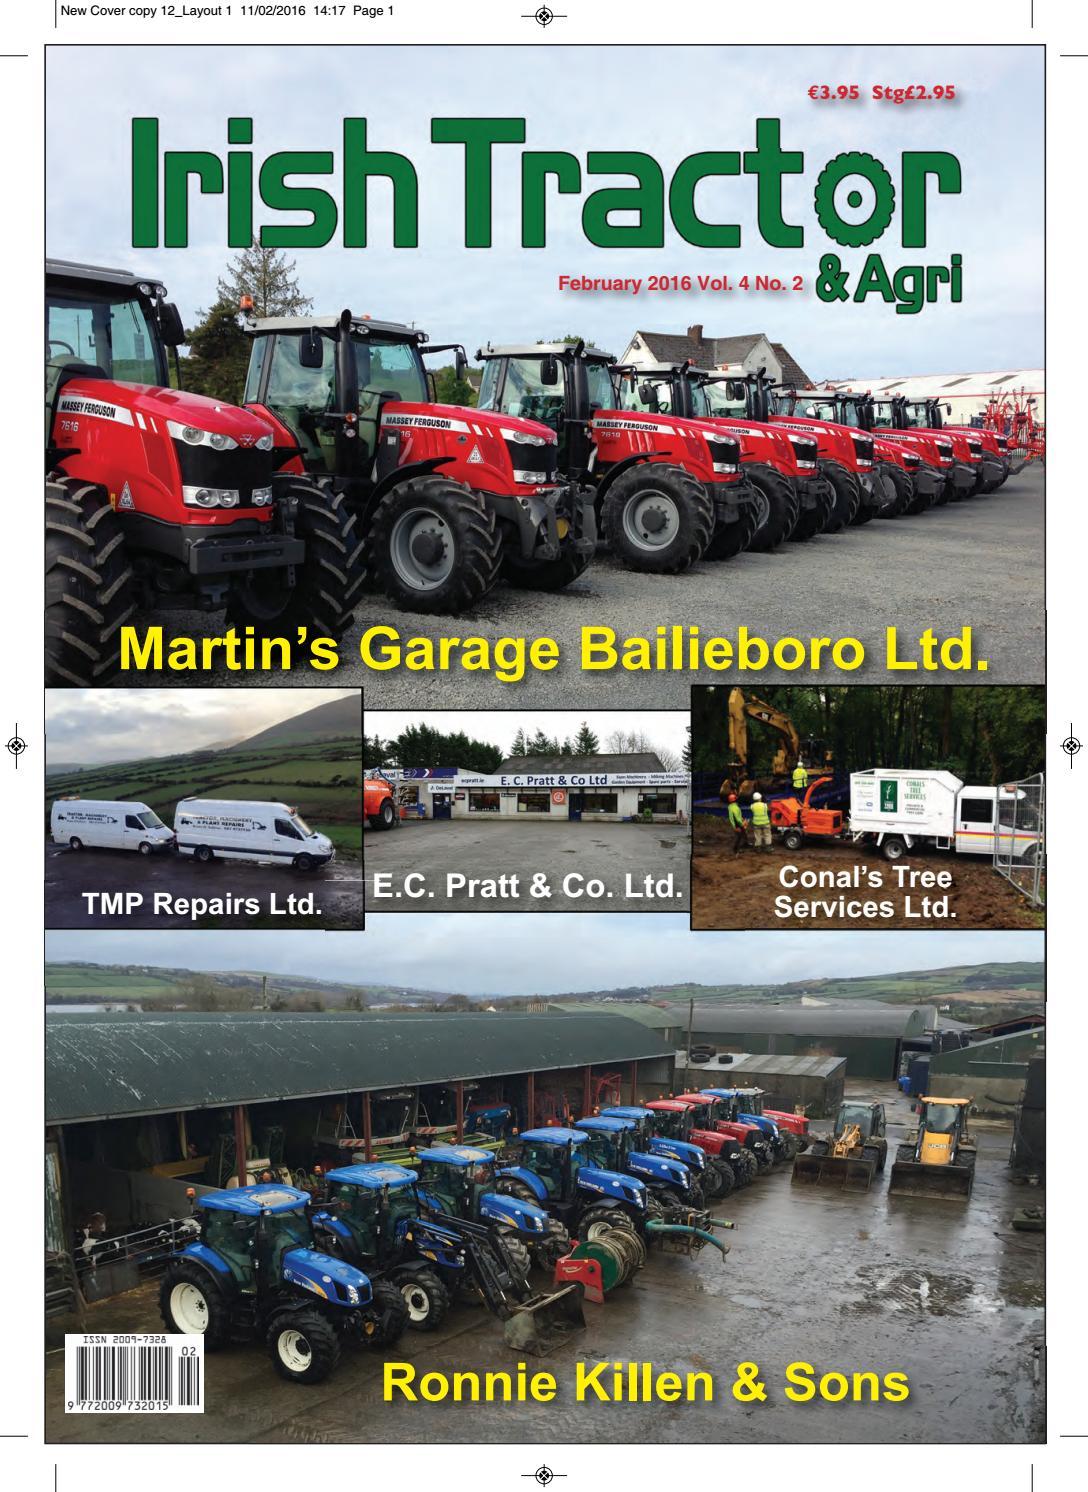 GoLo Insurance, Carrickmacross, Co. Monaghan - GoLo